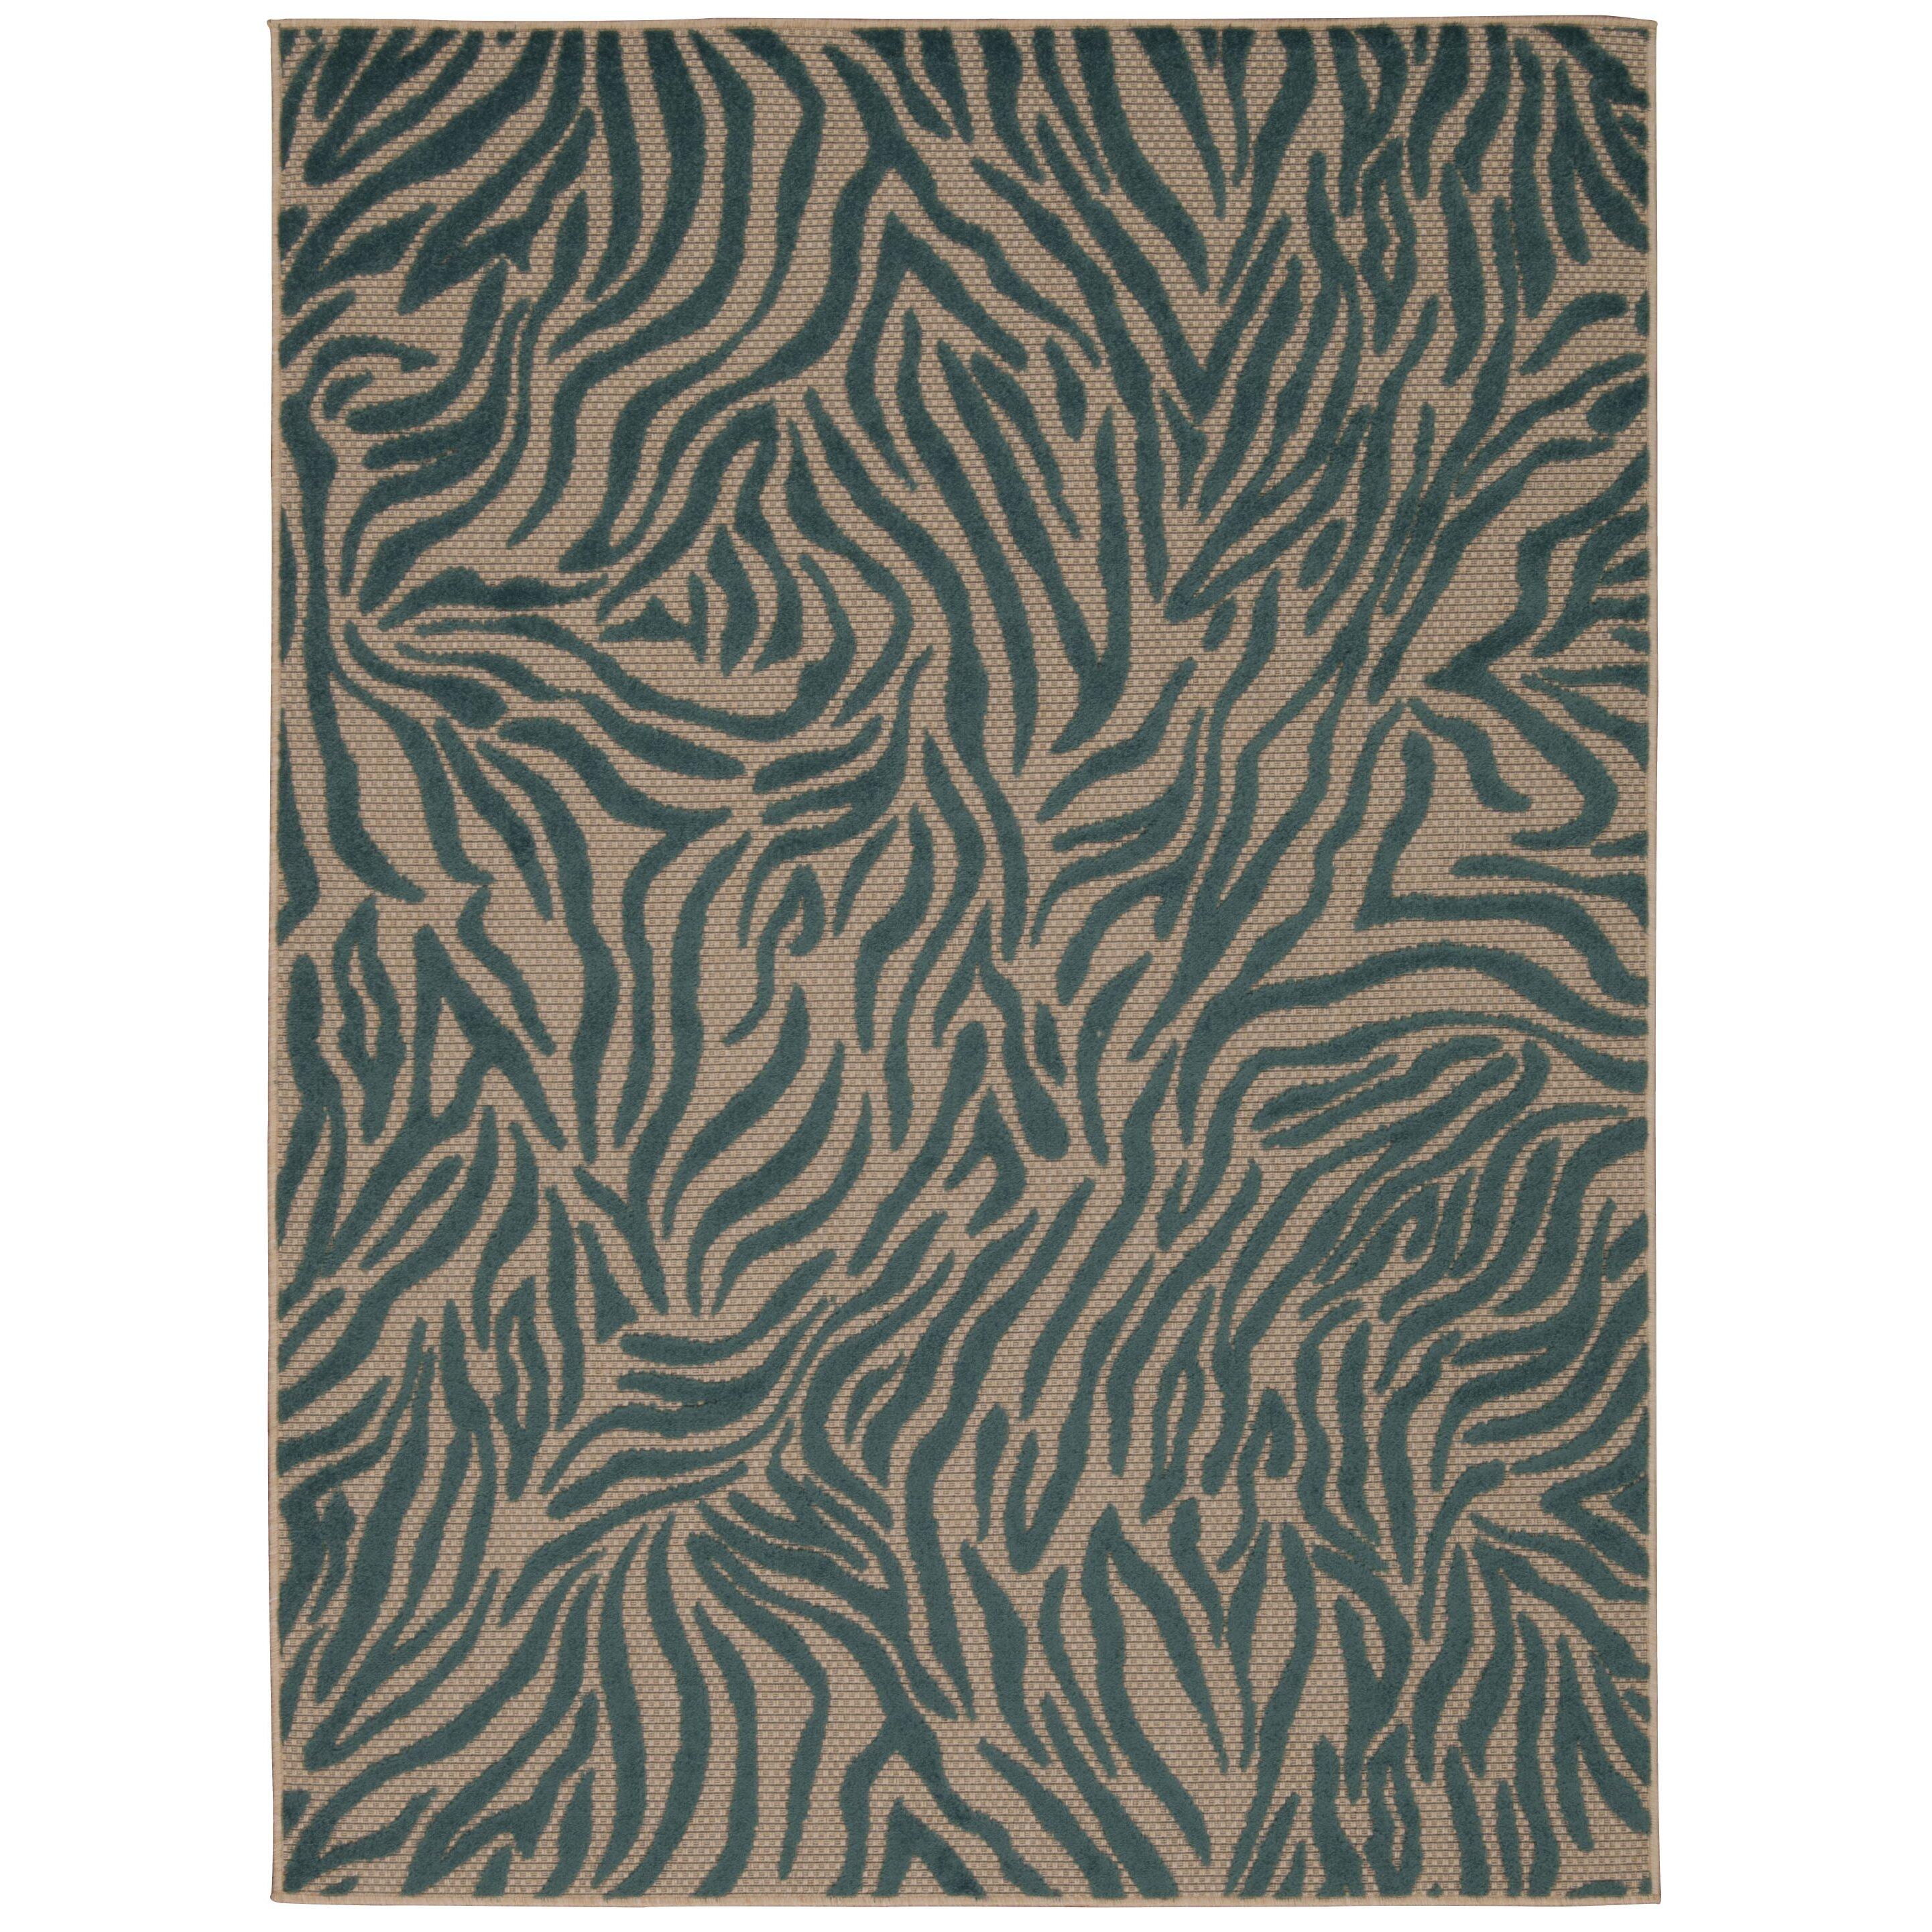 Nourison aloha blue indoor outdoor area rug for Blue indoor outdoor rug